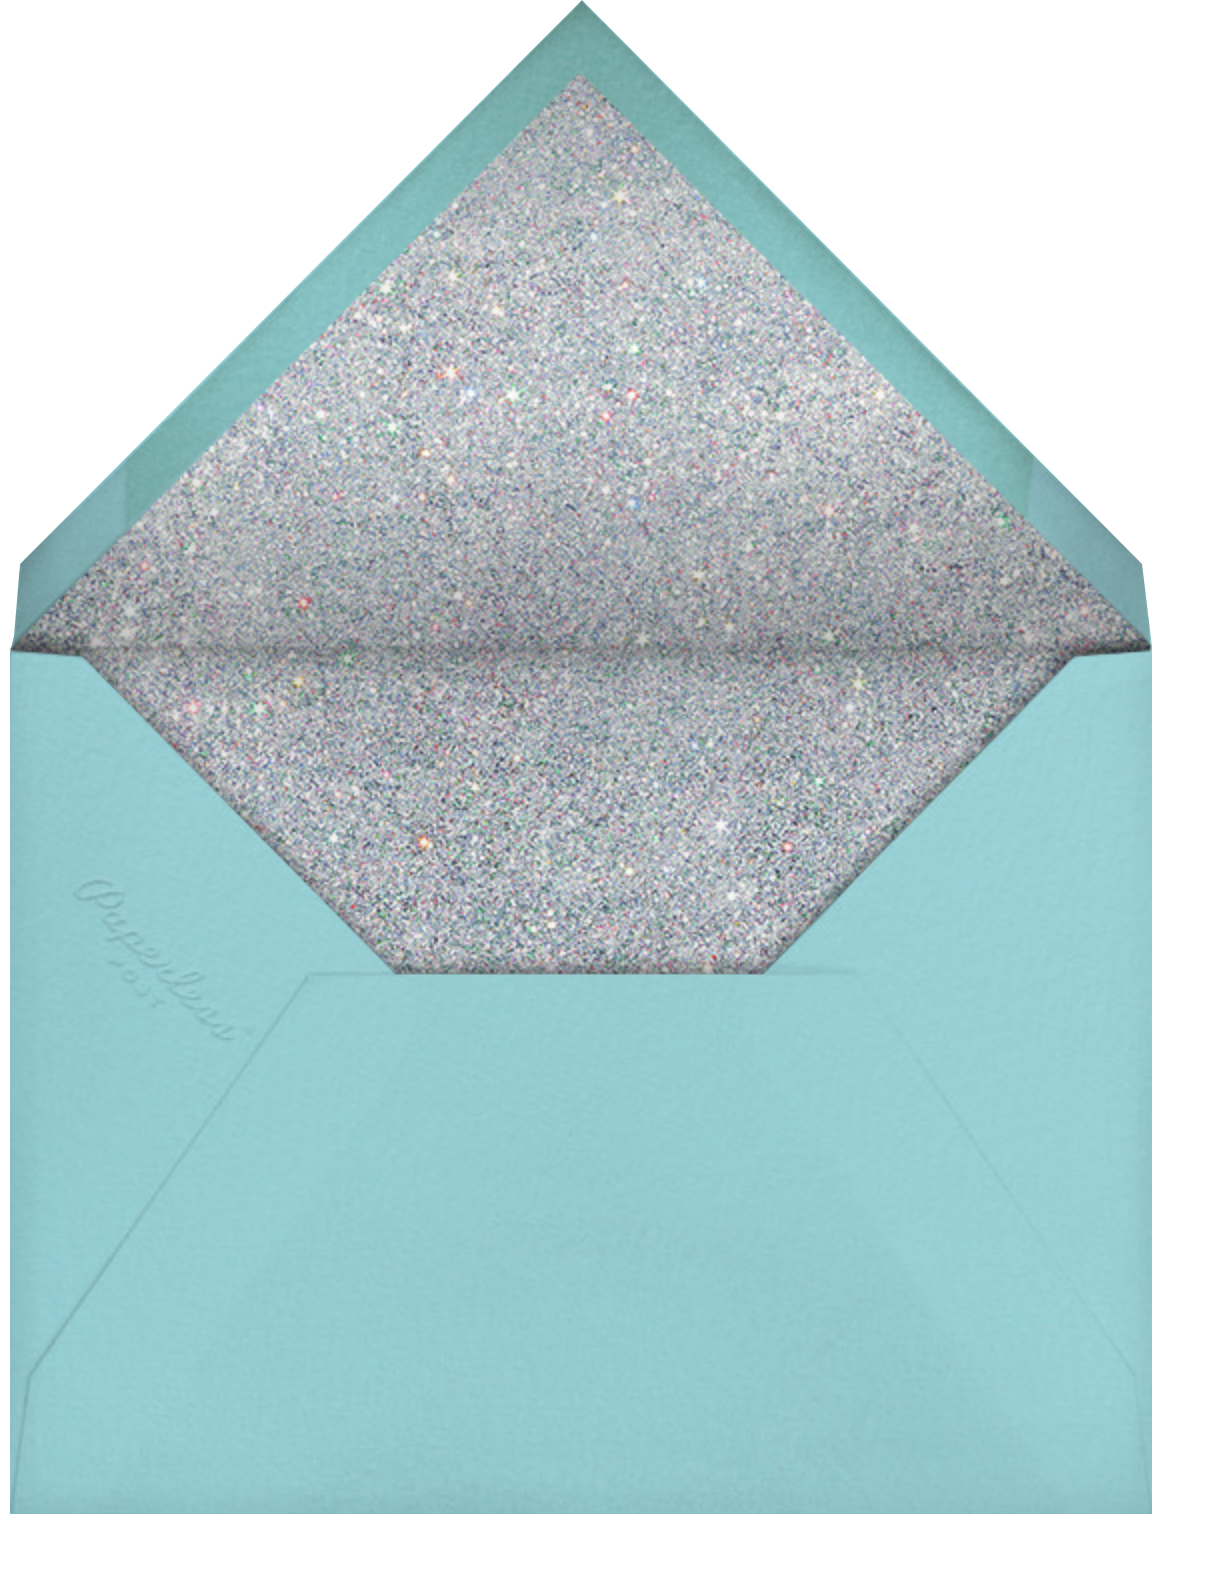 Glitter Glamour - Paperless Post - Quinceañera - envelope back